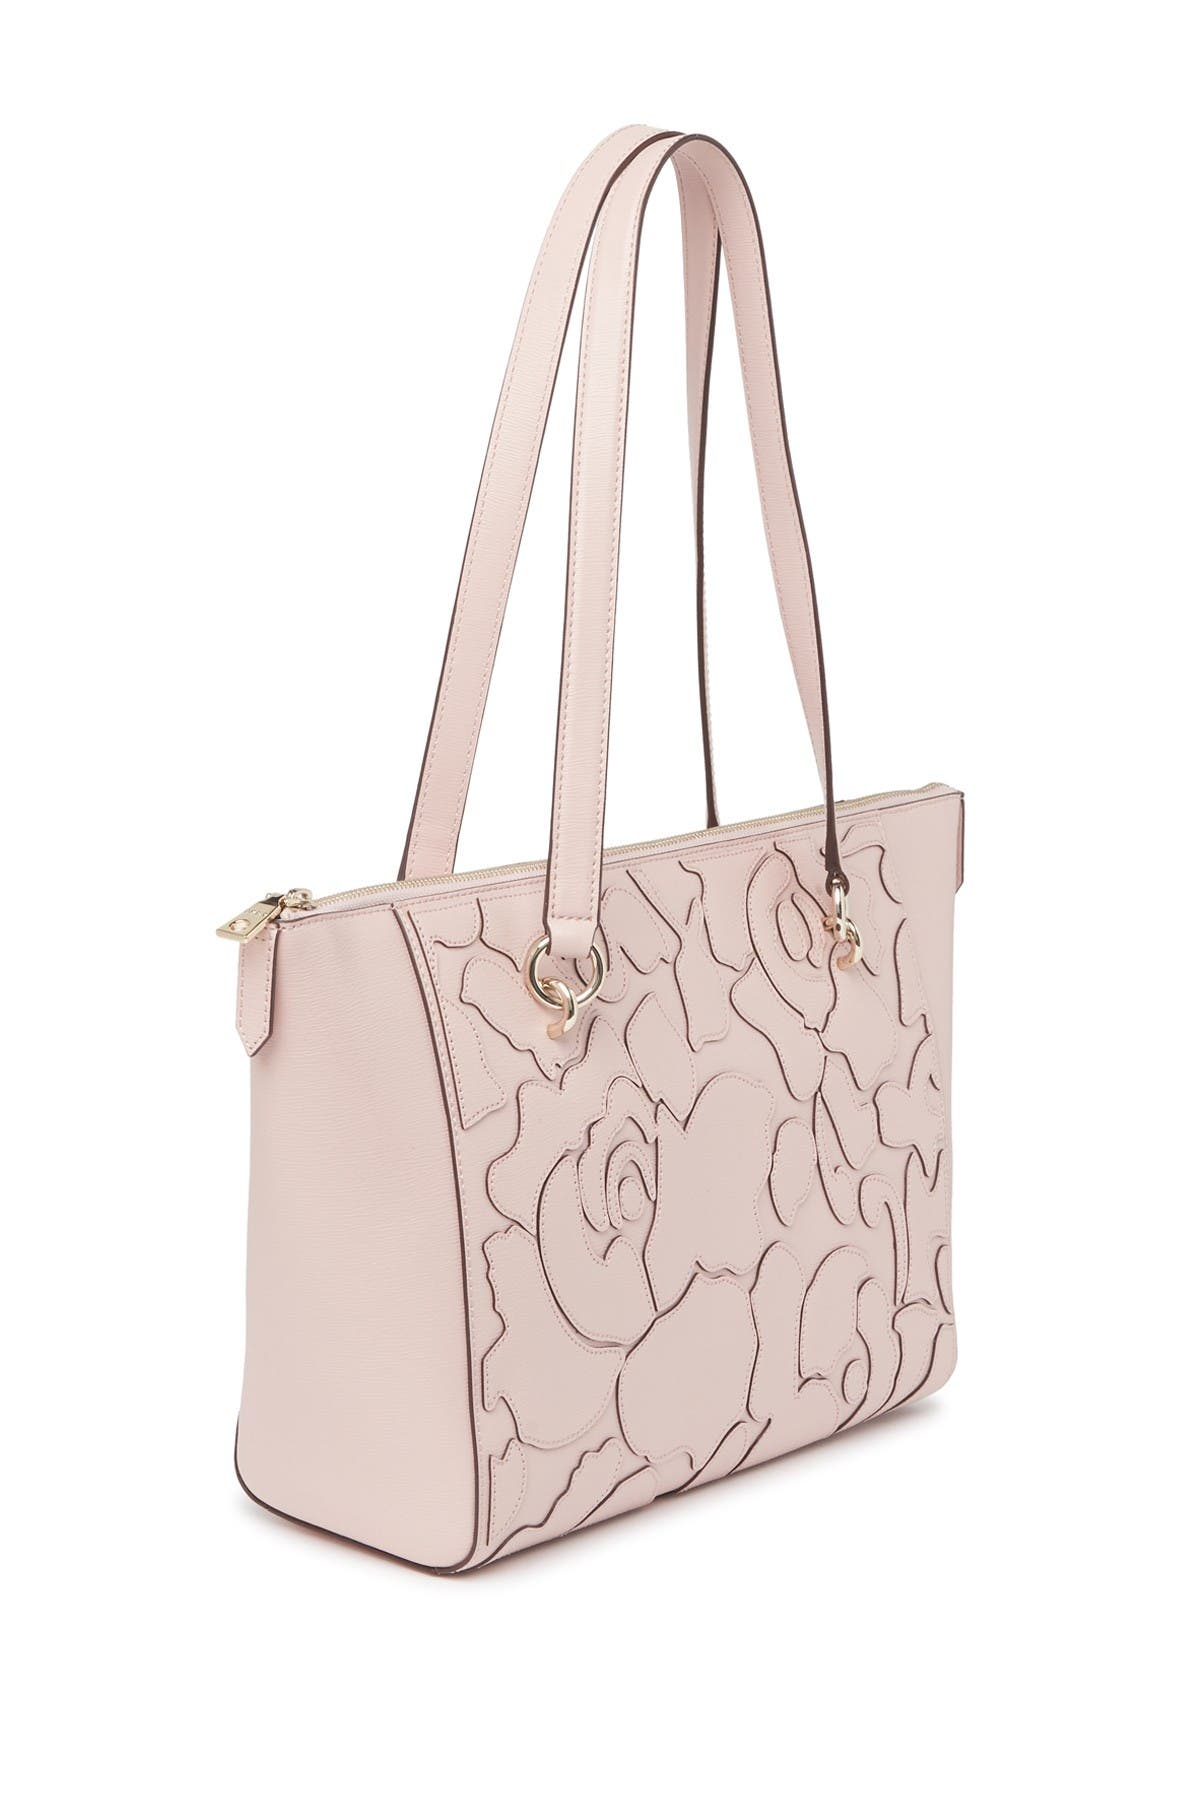 Image of DKNY Sara Abstract Print Leather Tote Bag